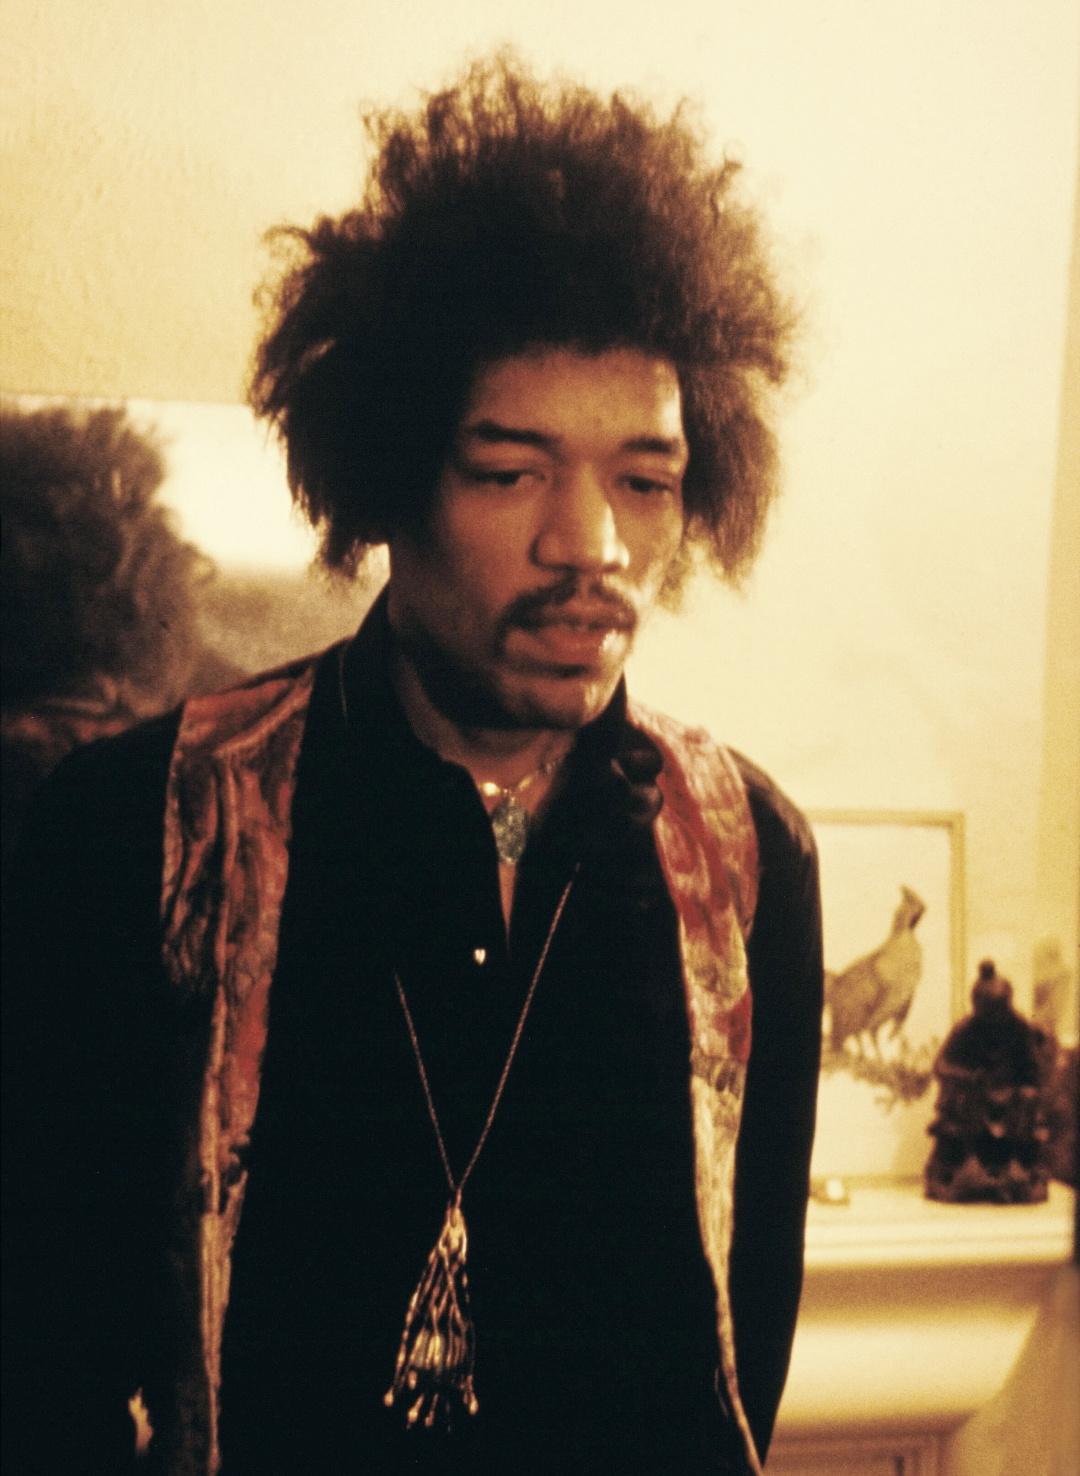 Джими у камина, 7 января 1969 г.